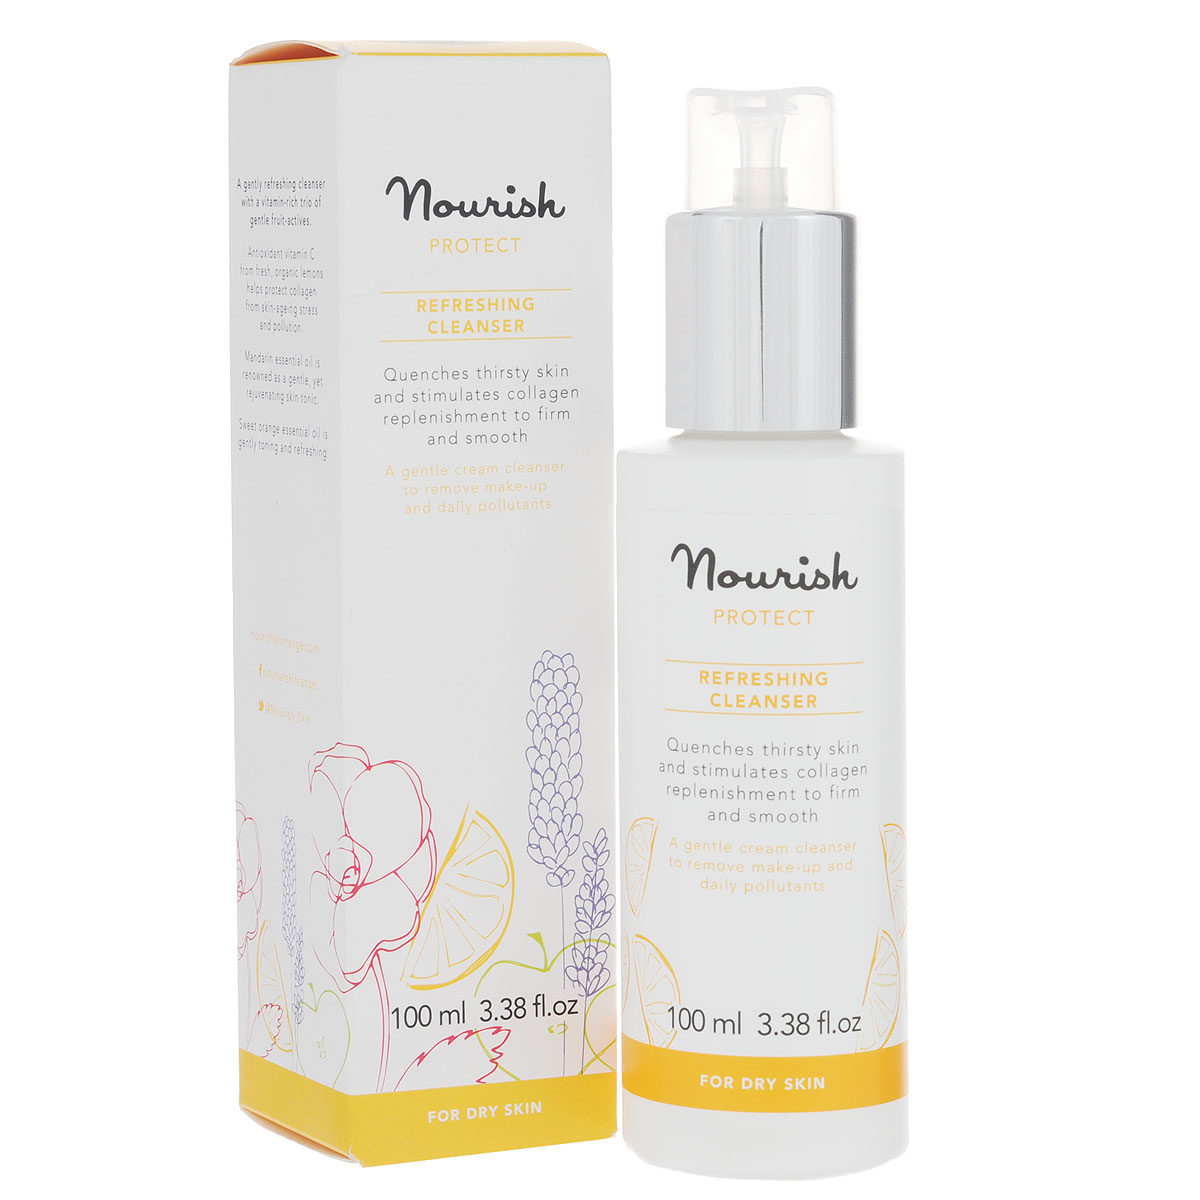 Nourish Молочко для лица Protect Refreshing Cleanser, очищающее, для сухой кожи, 100 мл nourish набор миниатюр для сухой кожей лица nourish protect mini kit 50 мл 50 мл 15 мл 15 мл